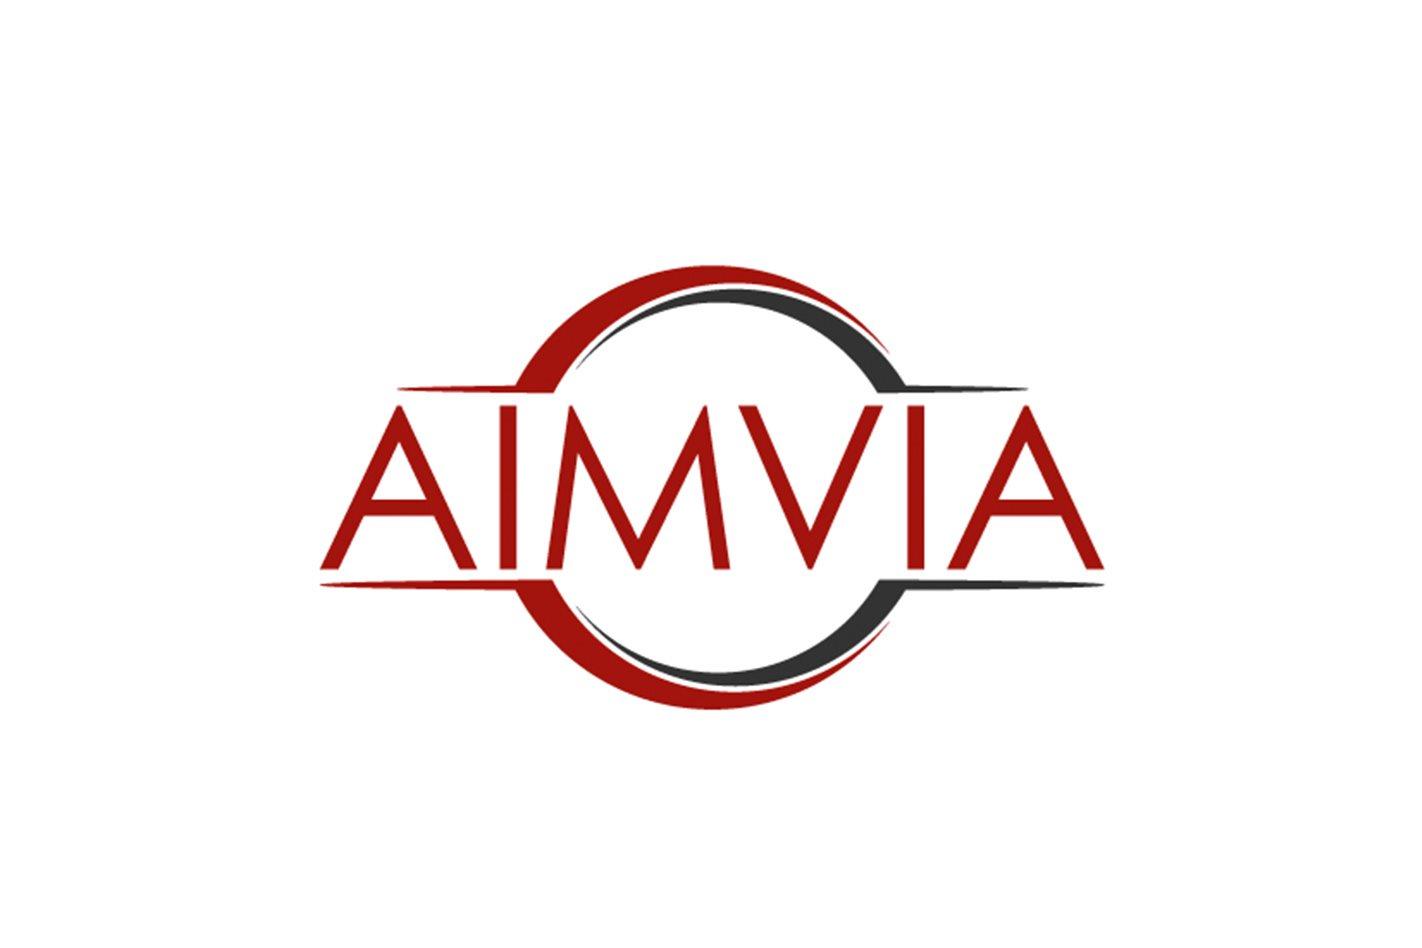 Australian Imported Motor Vehicle Industry Association